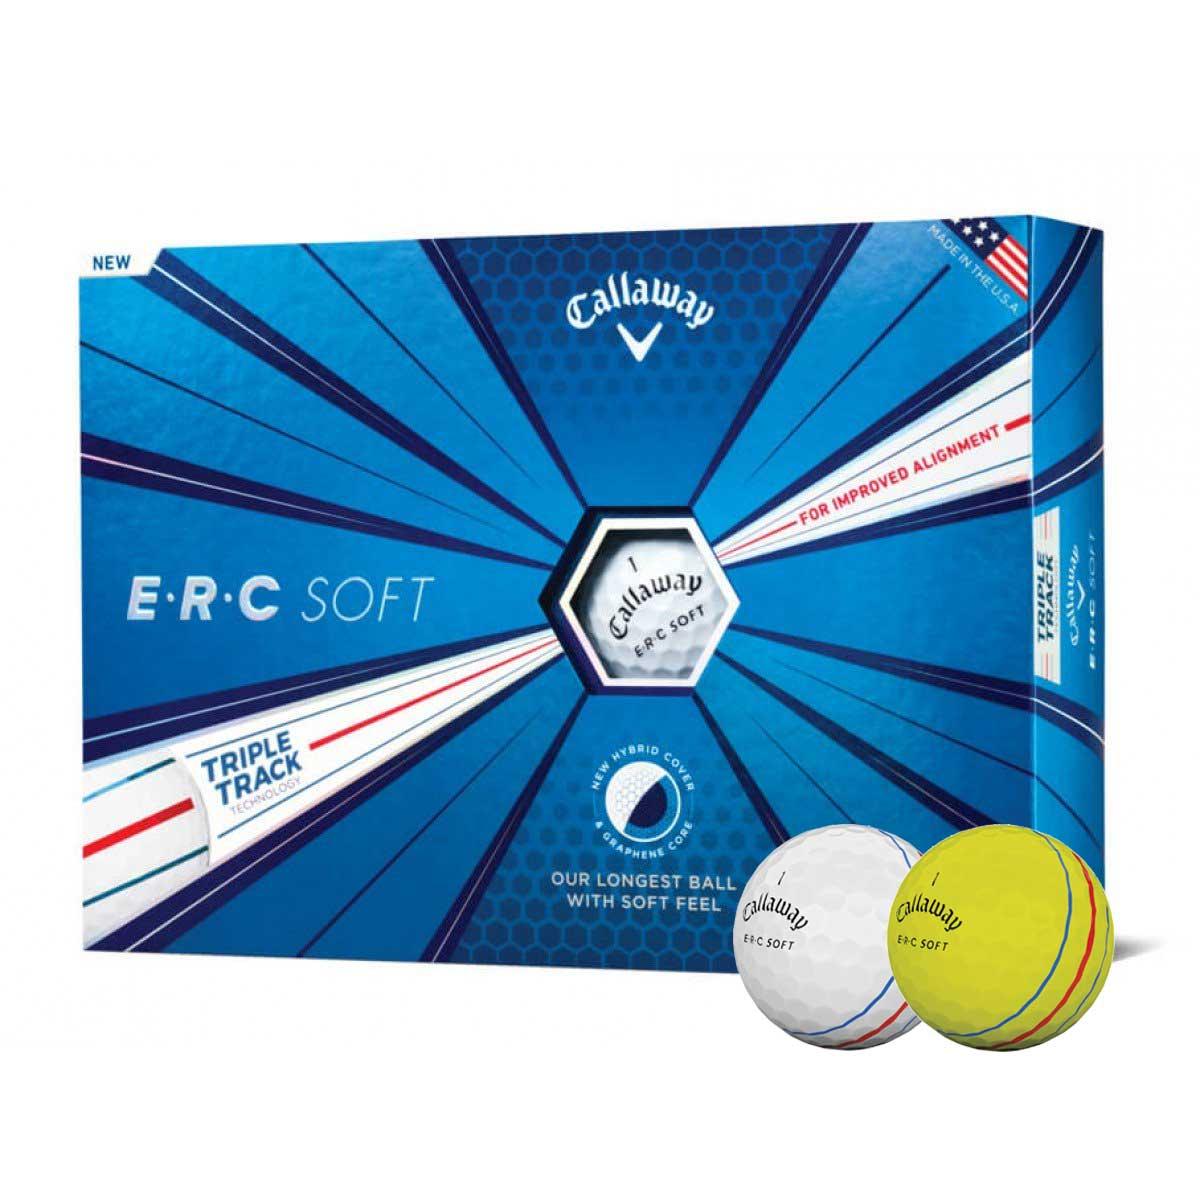 Callaway 2021 ERC Soft Triple Track Golf Balls